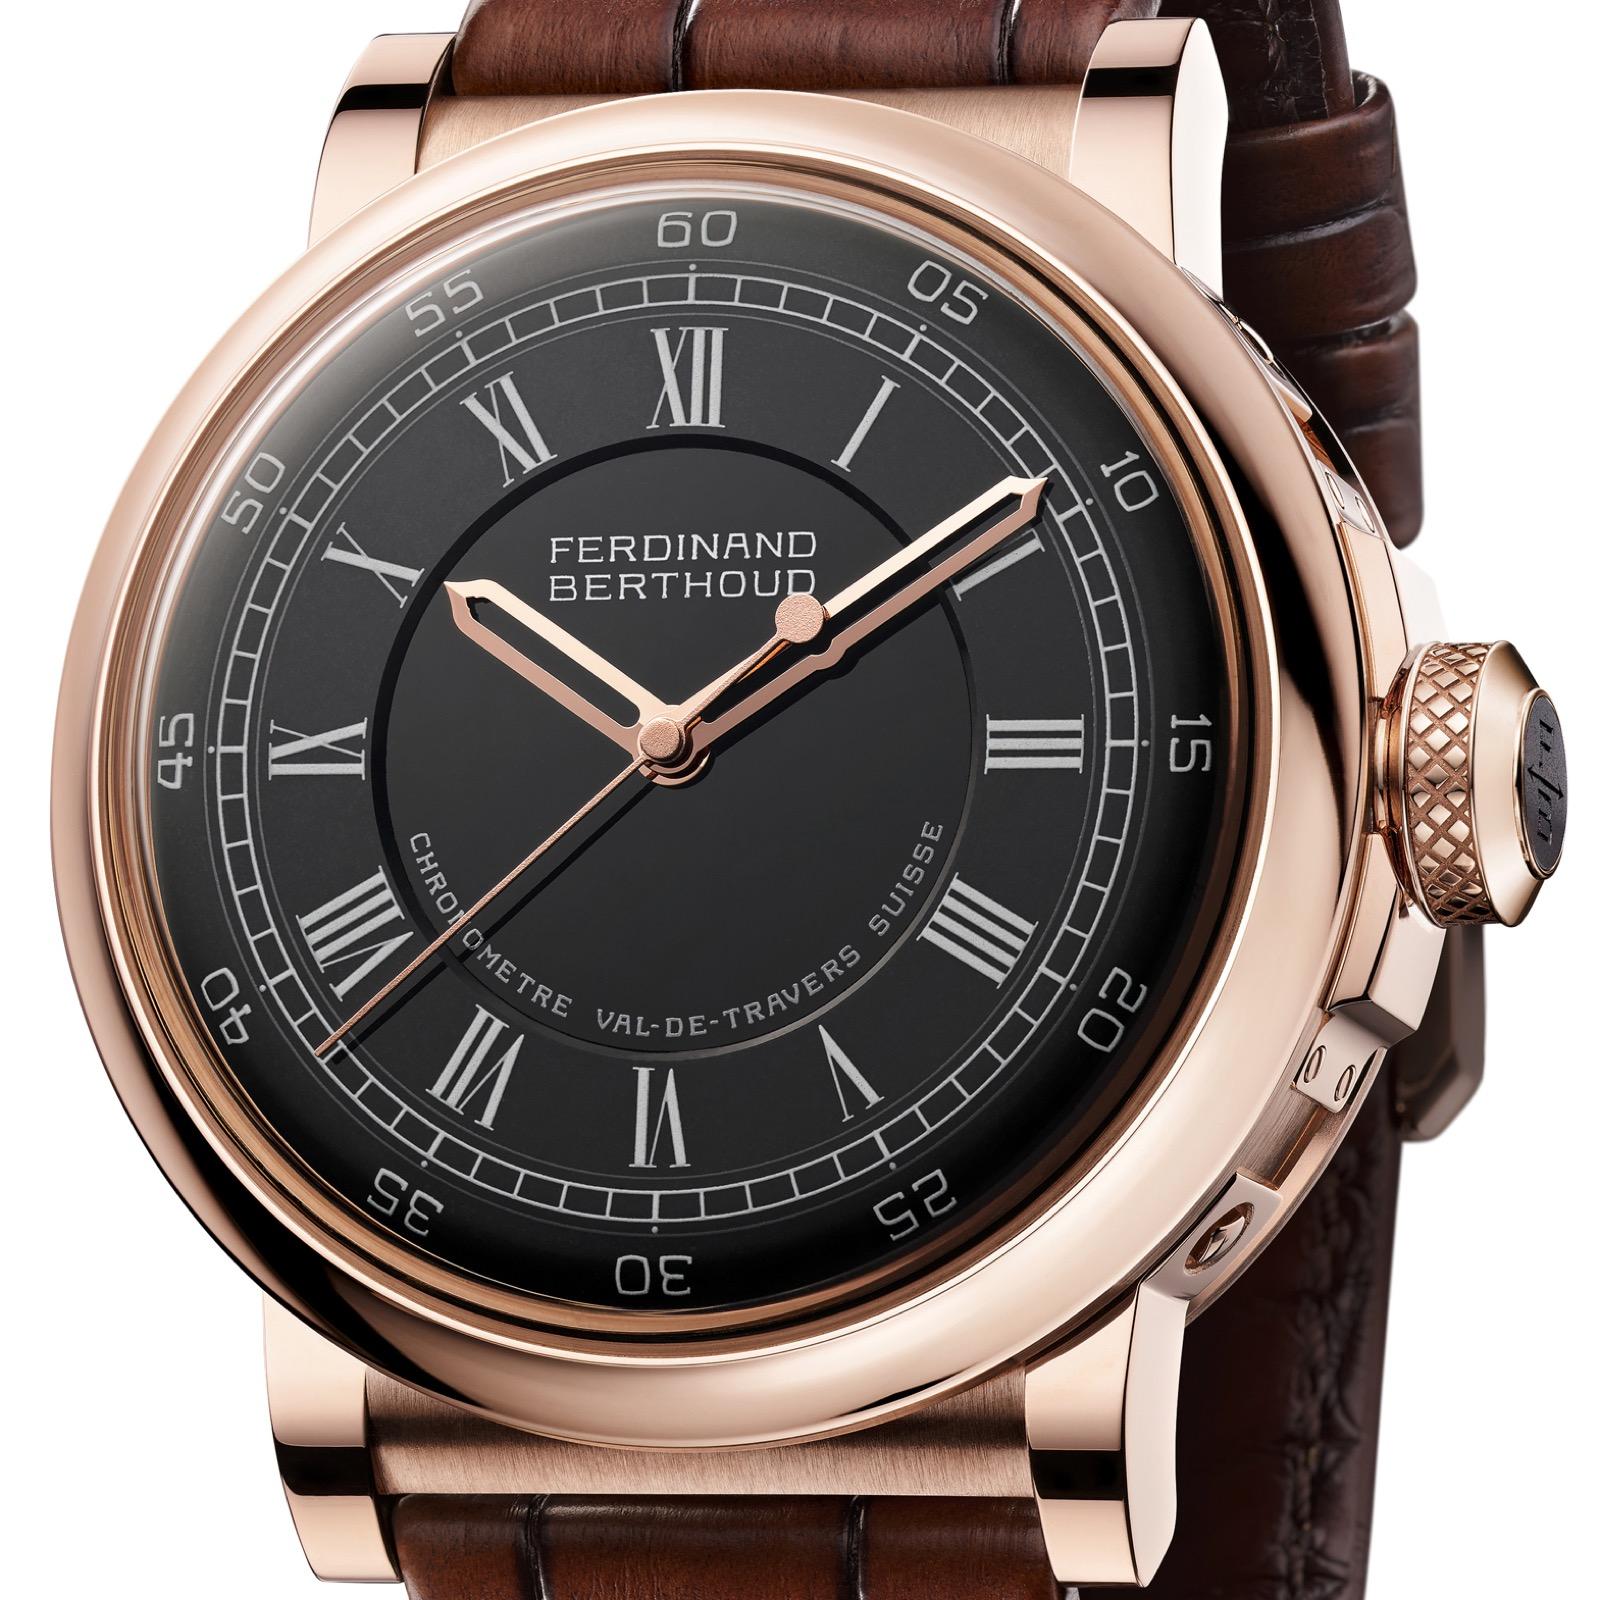 Chronométrie Ferdinand Berthoud - FB 2RE.2 GPHG